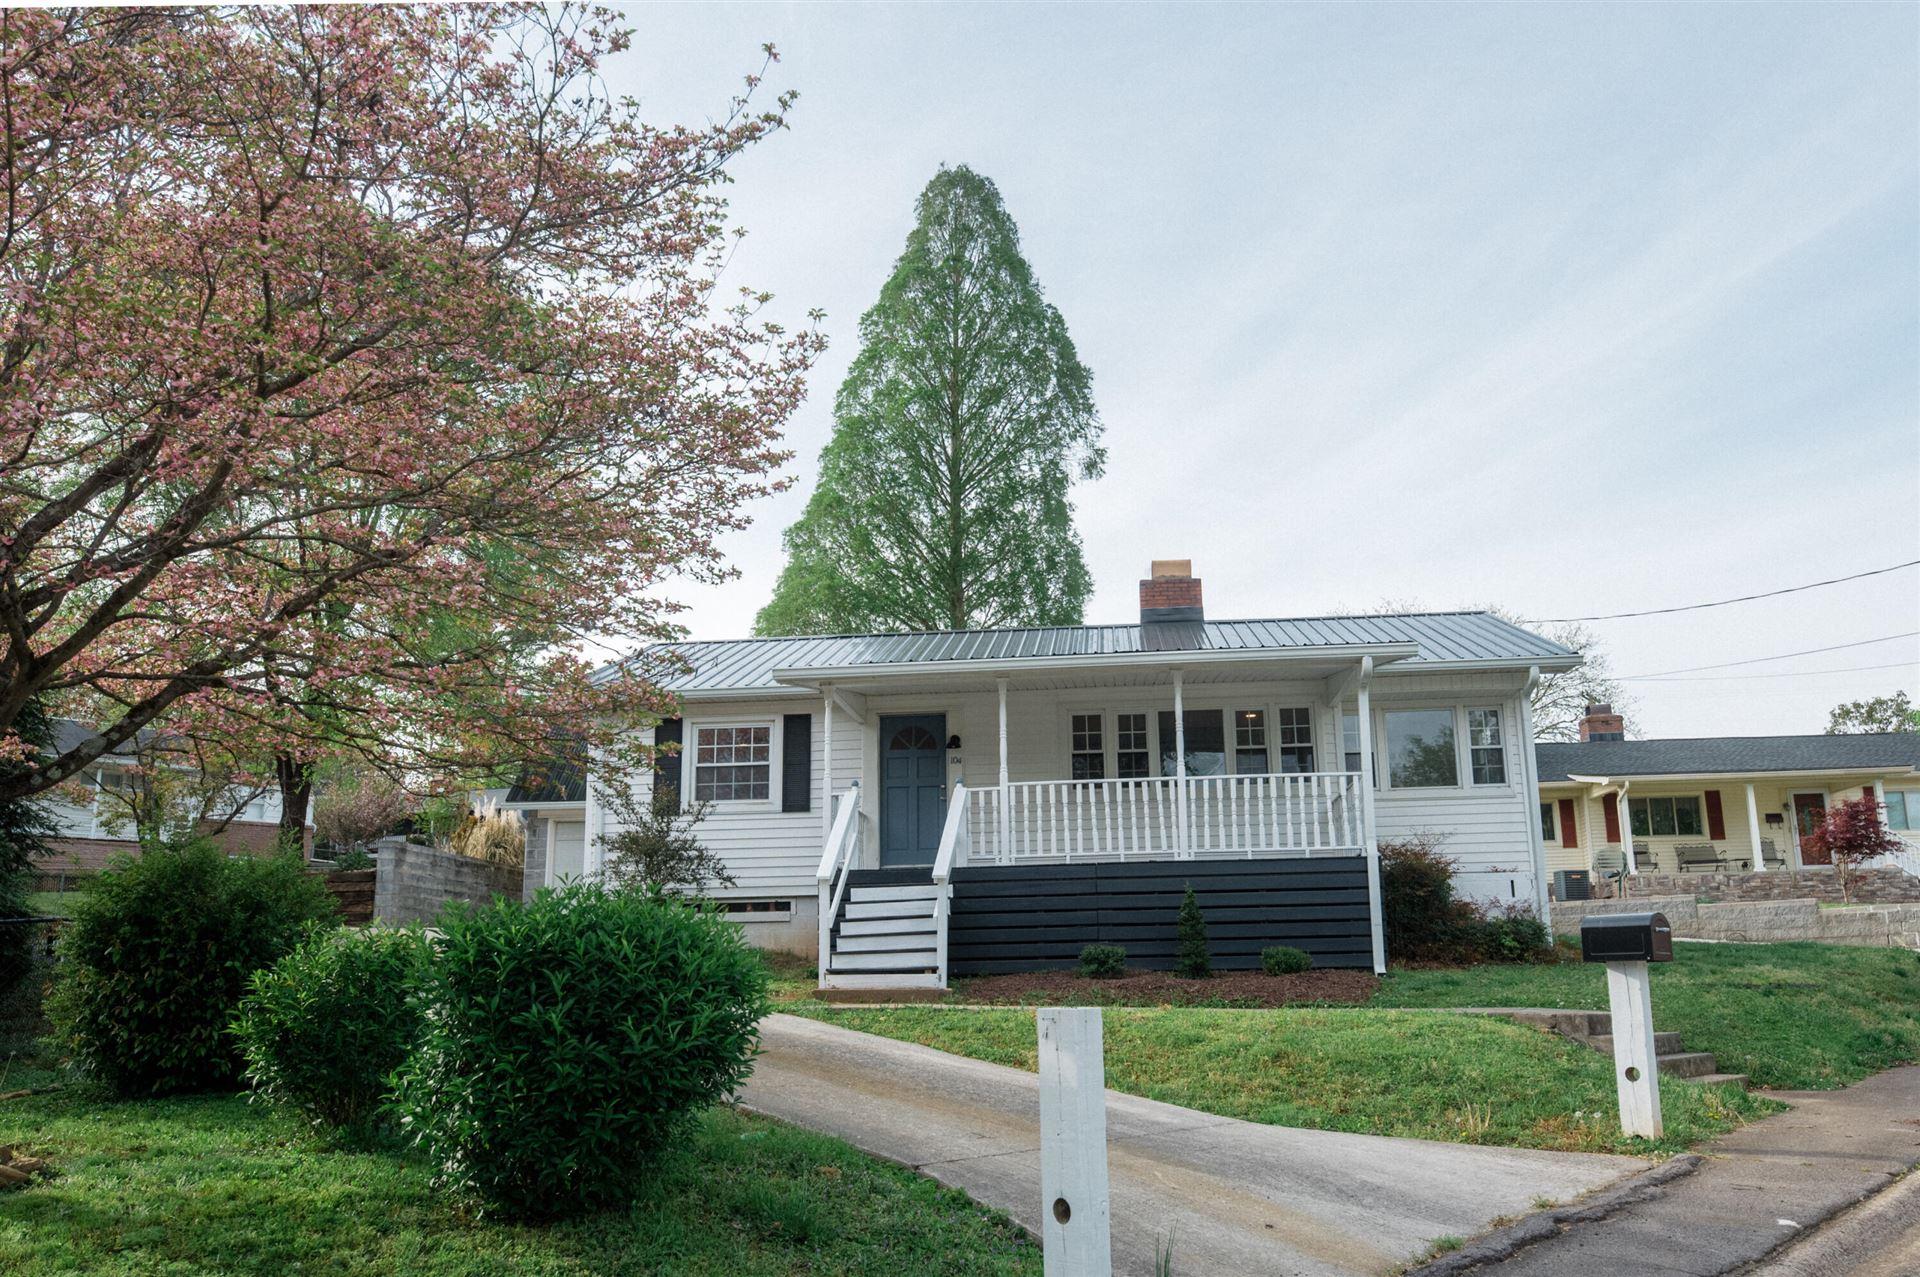 Photo of 104 Ulysses Lane, Oak Ridge, TN 37830 (MLS # 1149567)